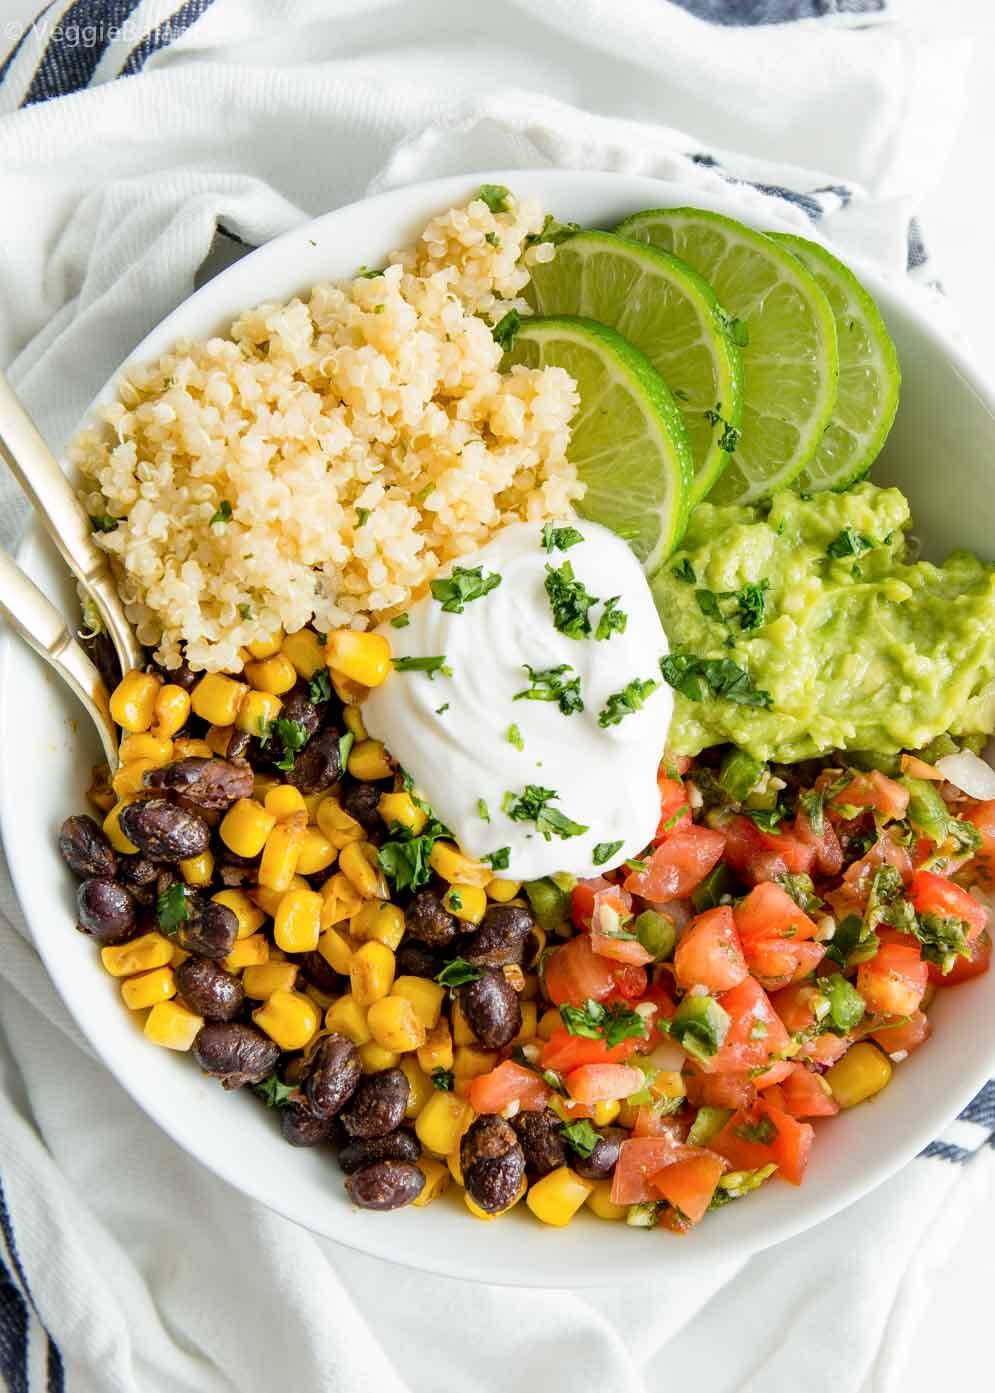 Easy Vegan Burrito Bowl built with white towel